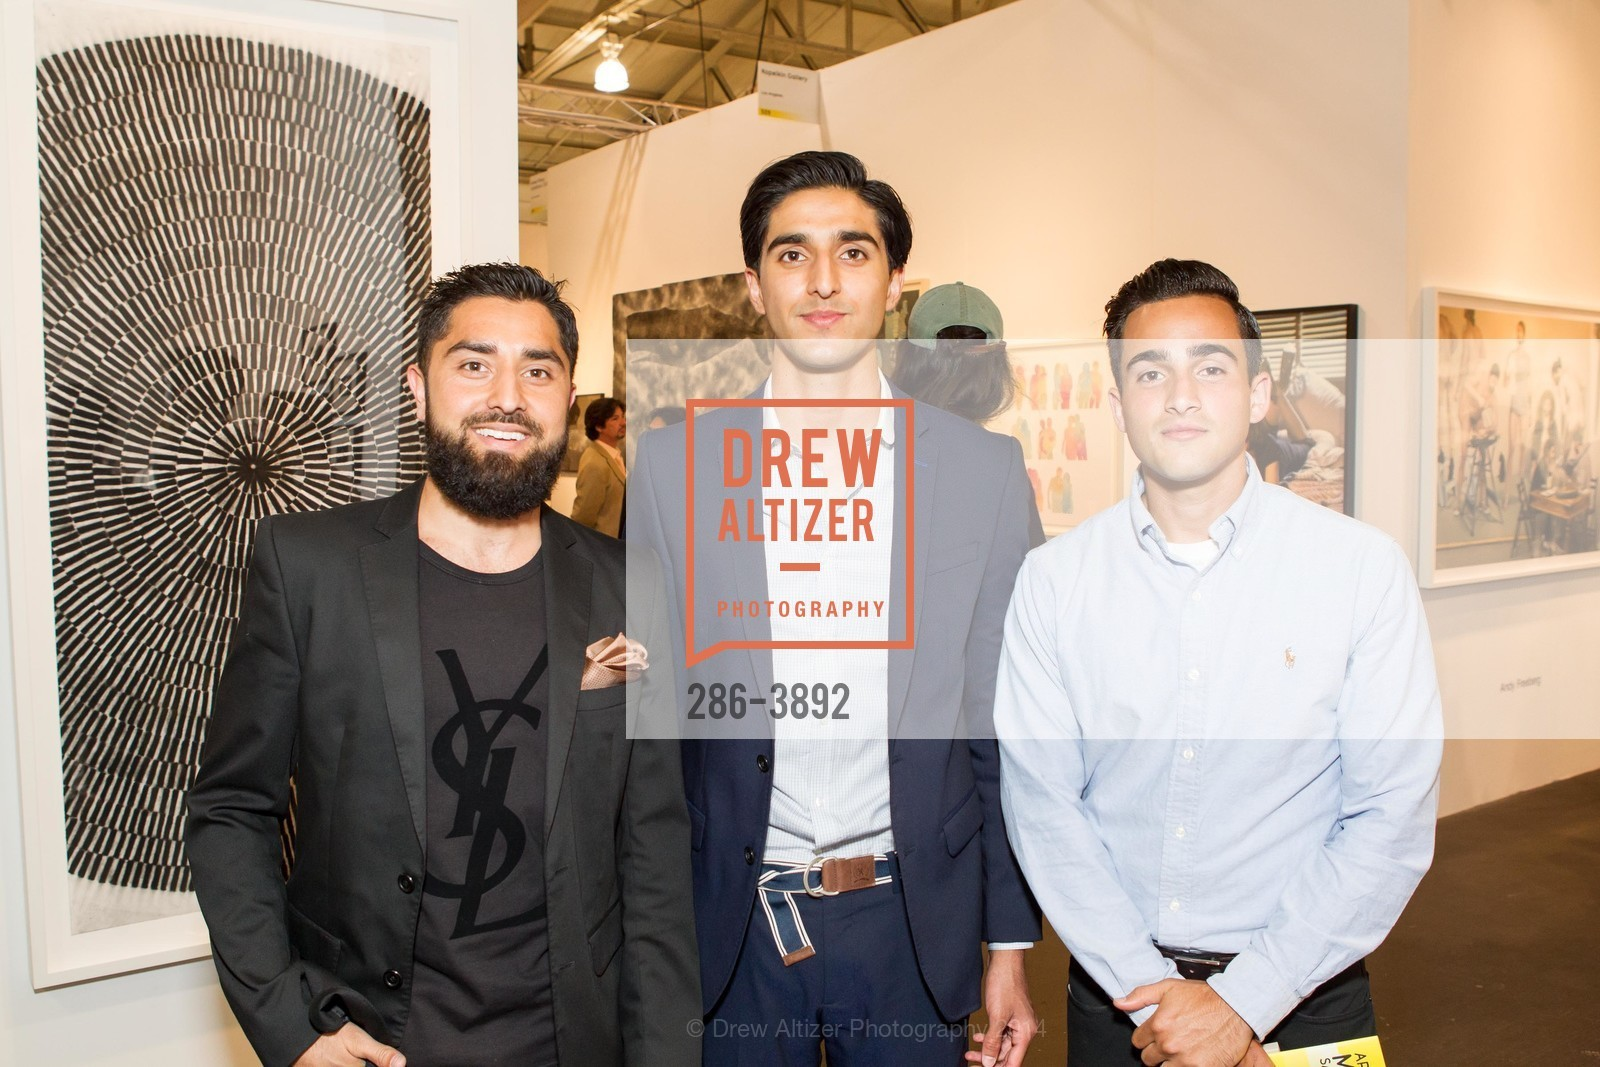 Roh Habibi, Ramin Habibi, Masoud Ardestani, Photo #286-3892